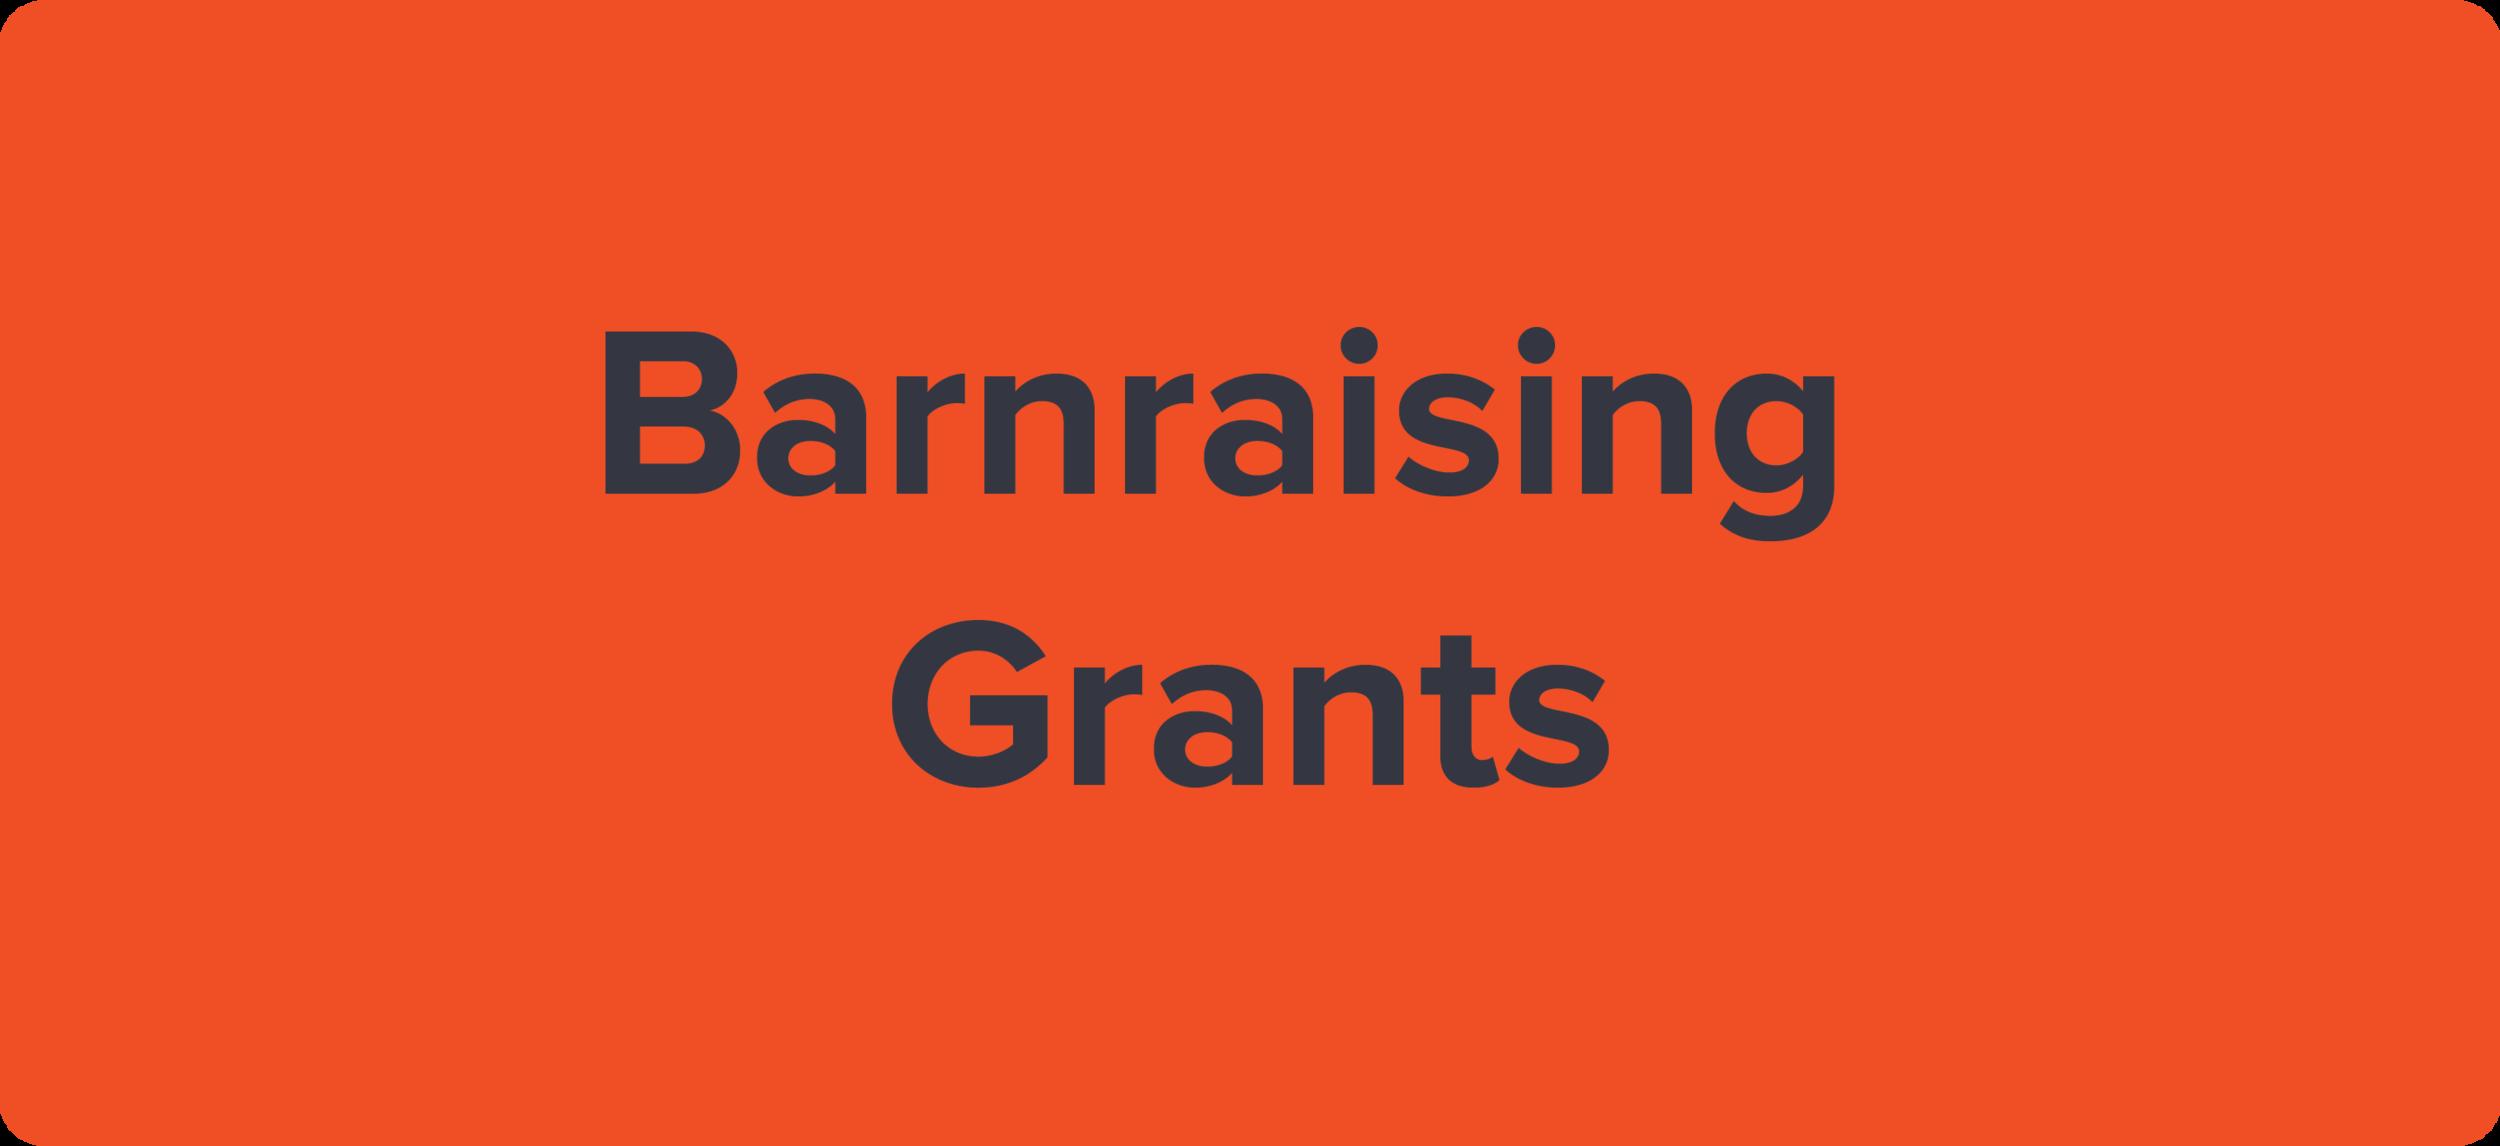 Barnraising Grants-03.png